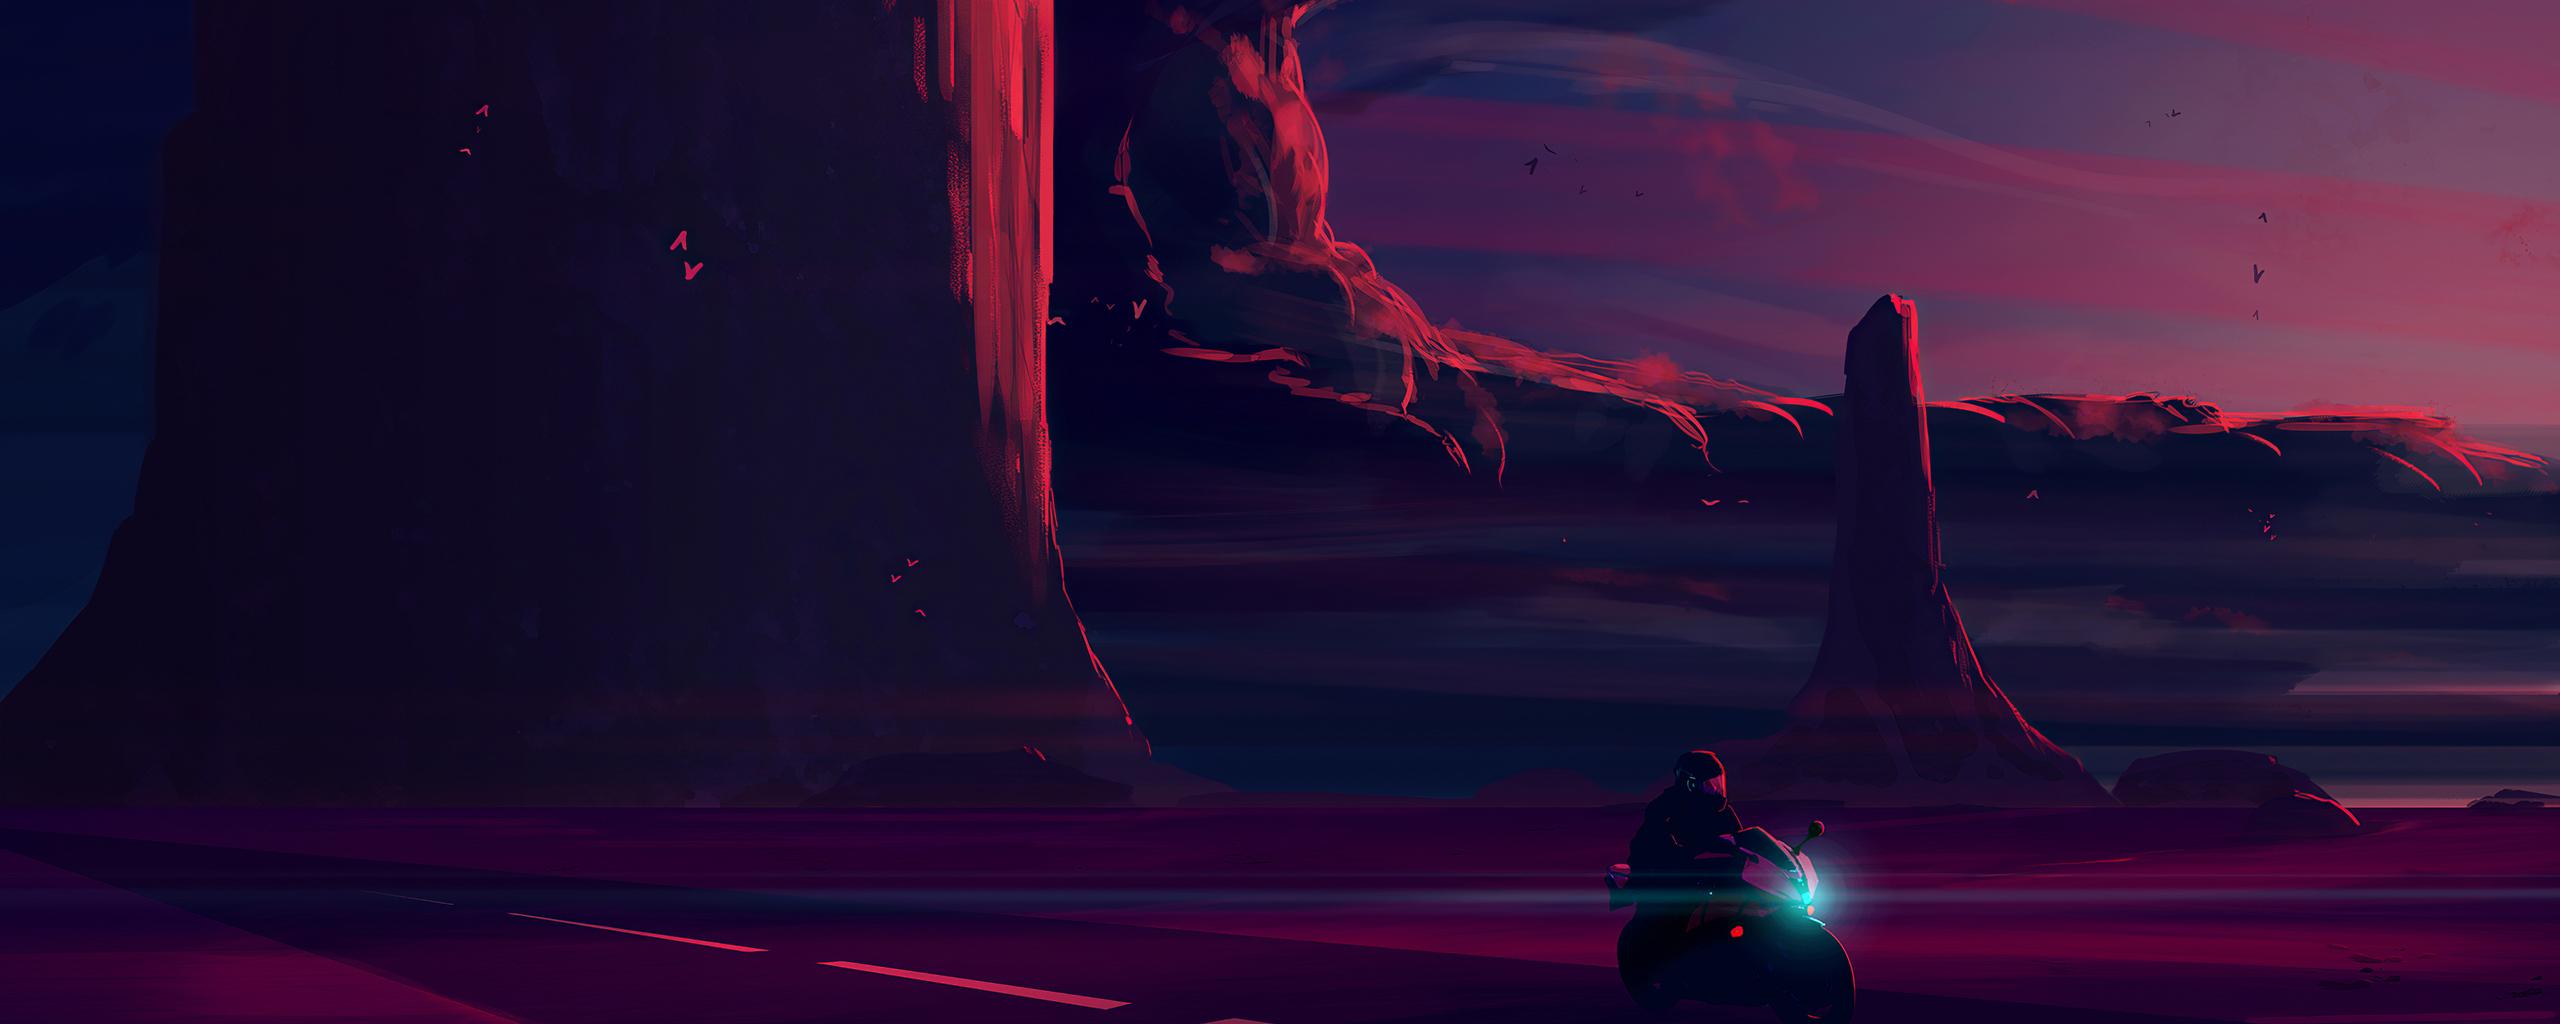 riding-through-the-night-5k-am.jpg